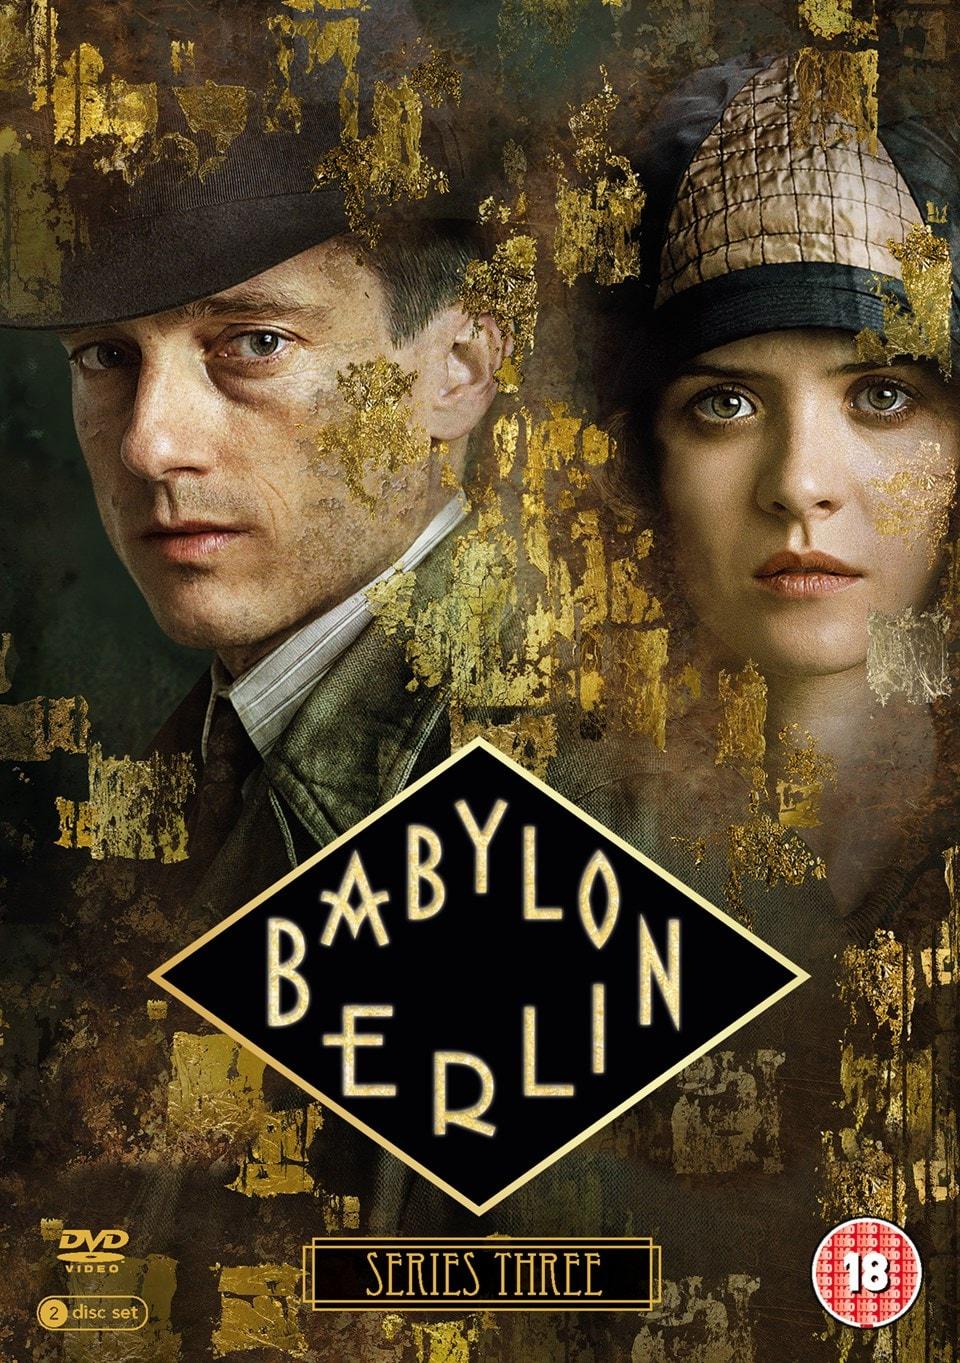 Babylon Berlin: Series Three - 1